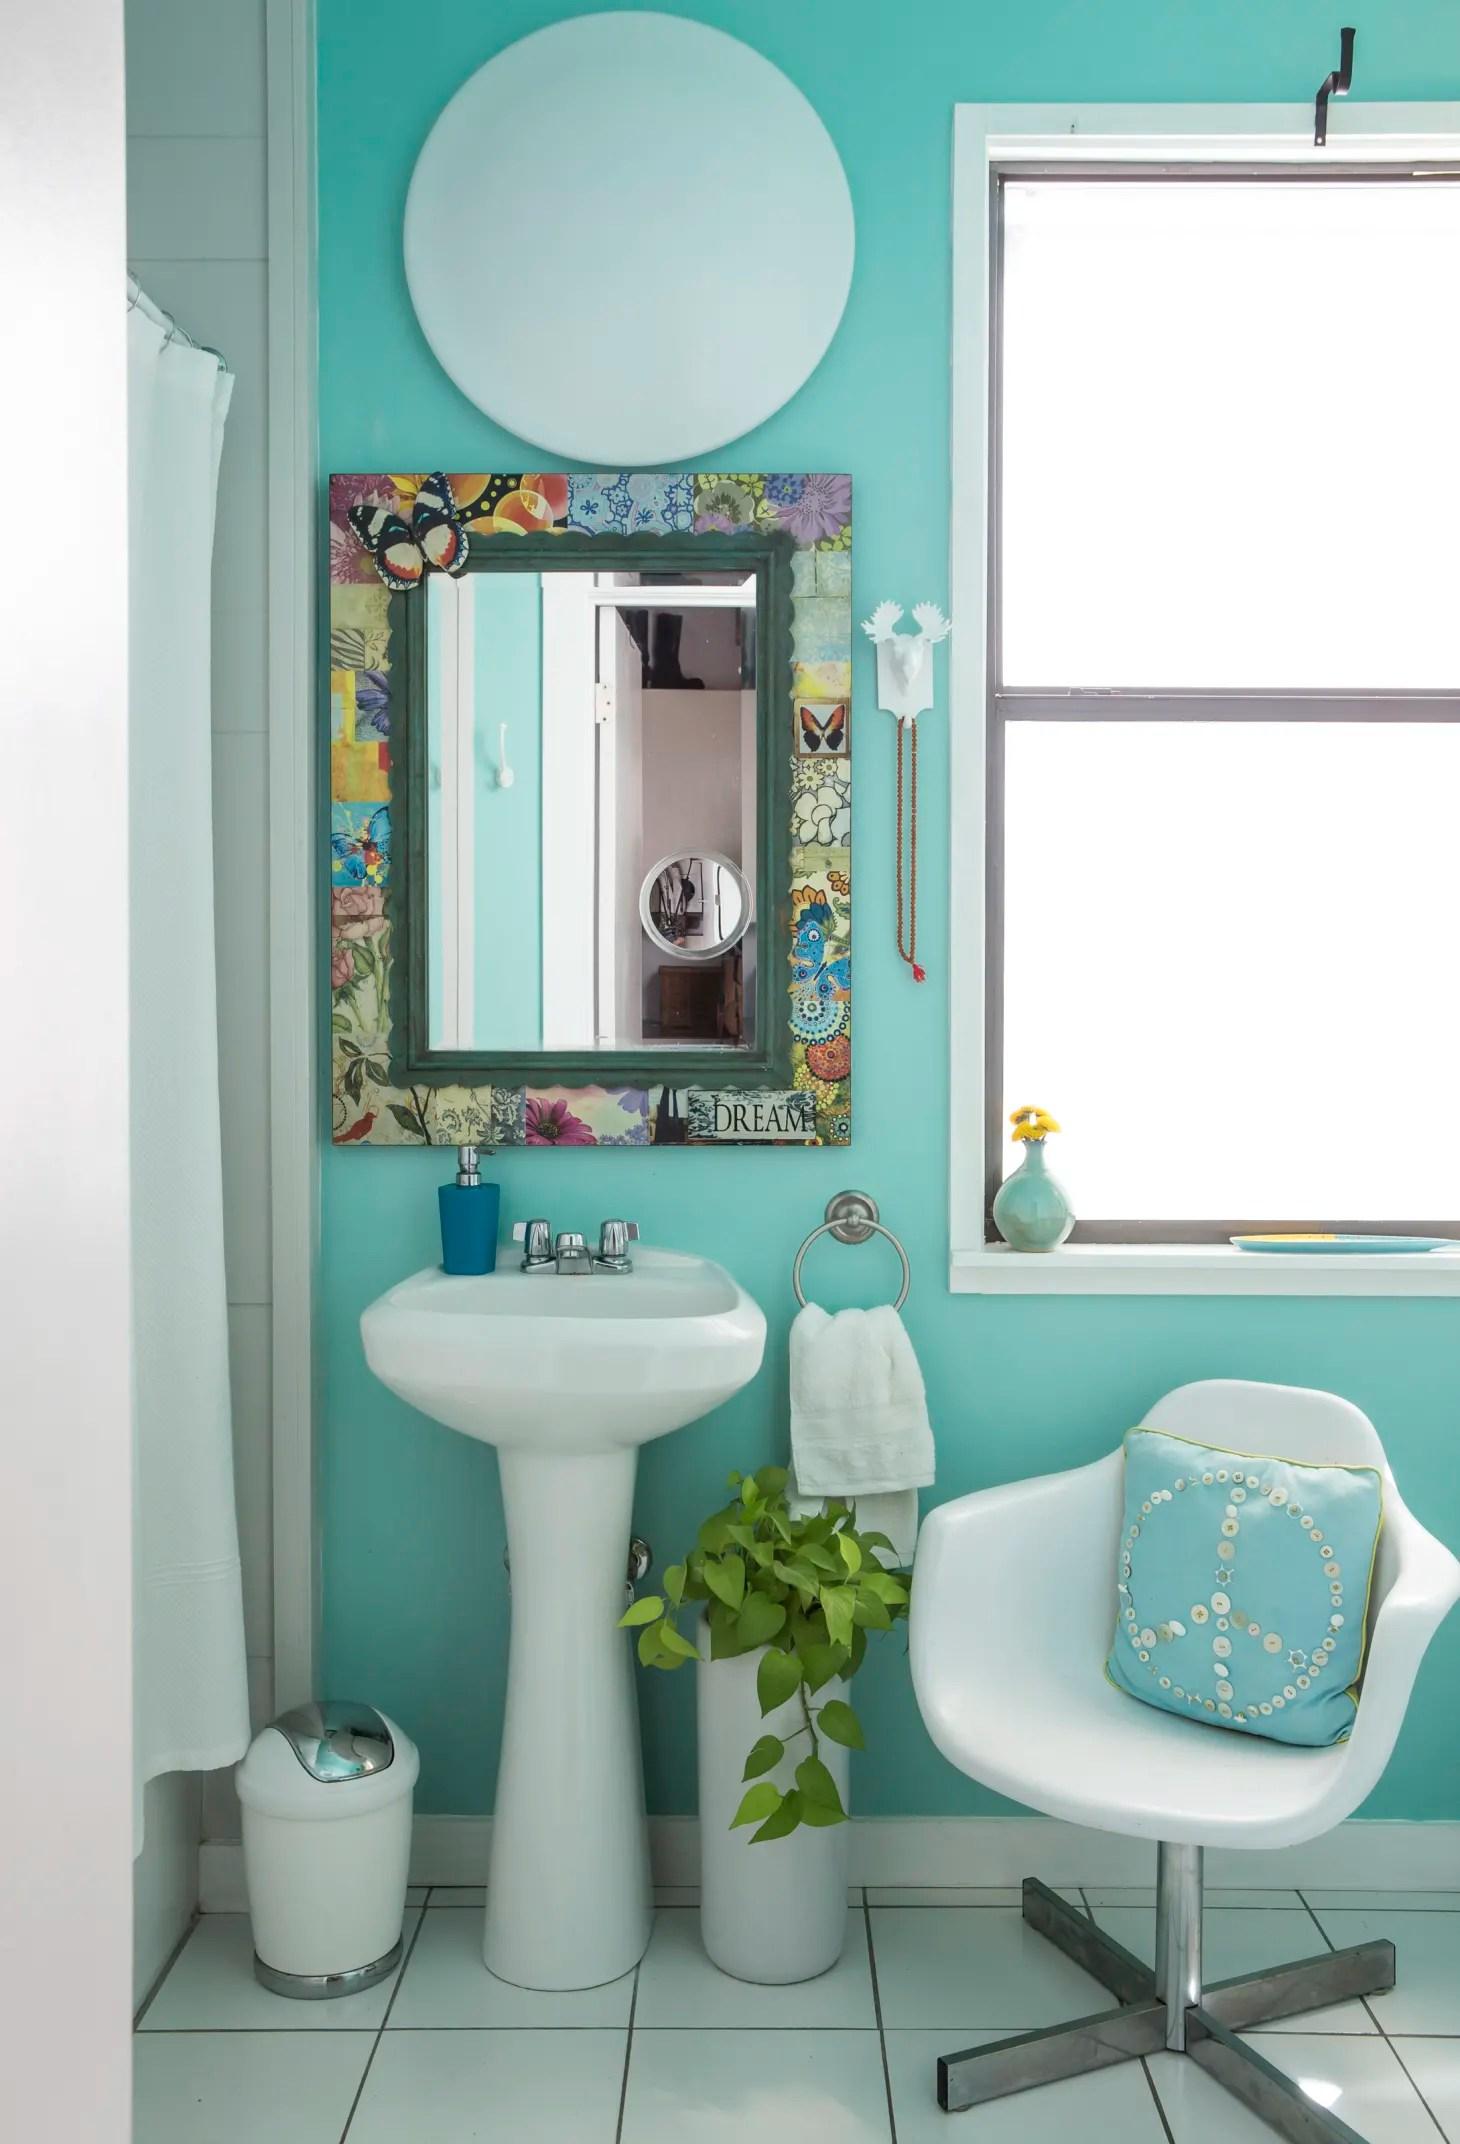 50 Best Small Bathroom Decorating Ideas - Tiny Bathroom ... on Bathroom Ideas Apartment  id=37183